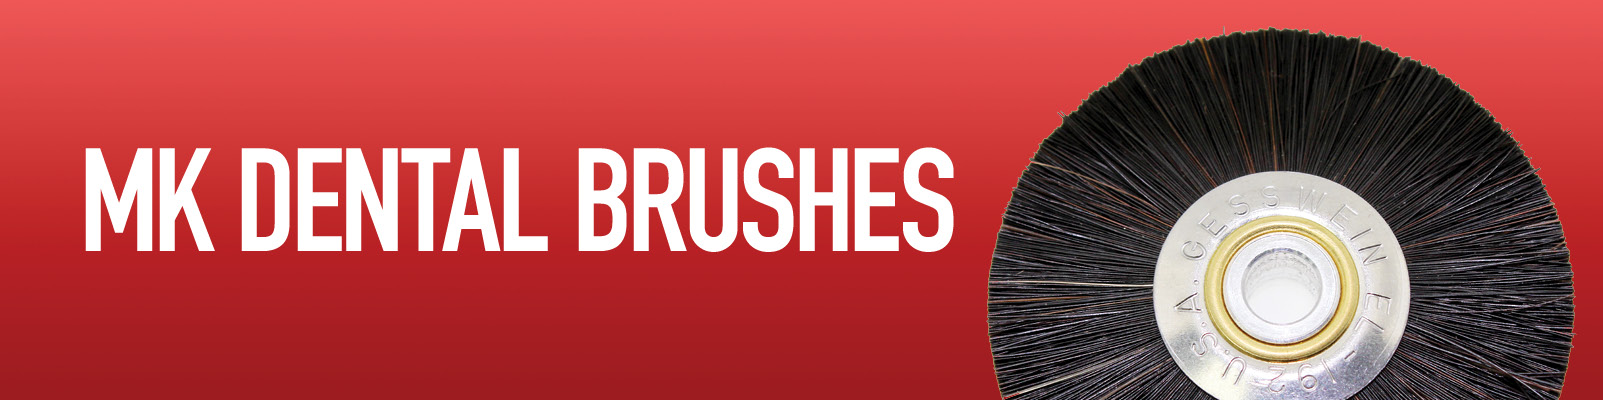 MK Dental Brushes